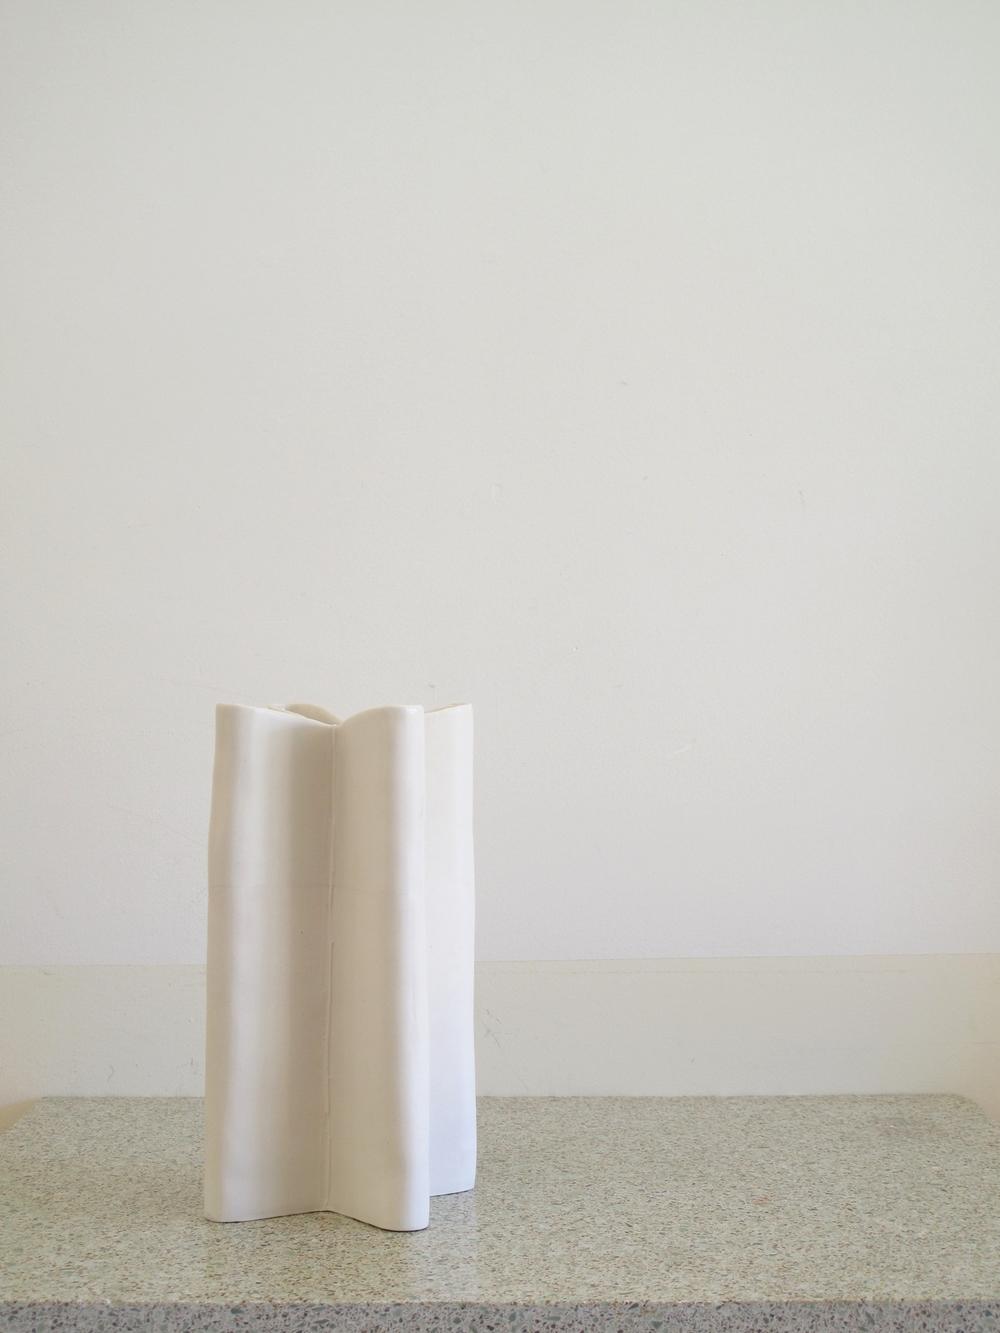 Plus Vase Alto (11 x 6 x 6)